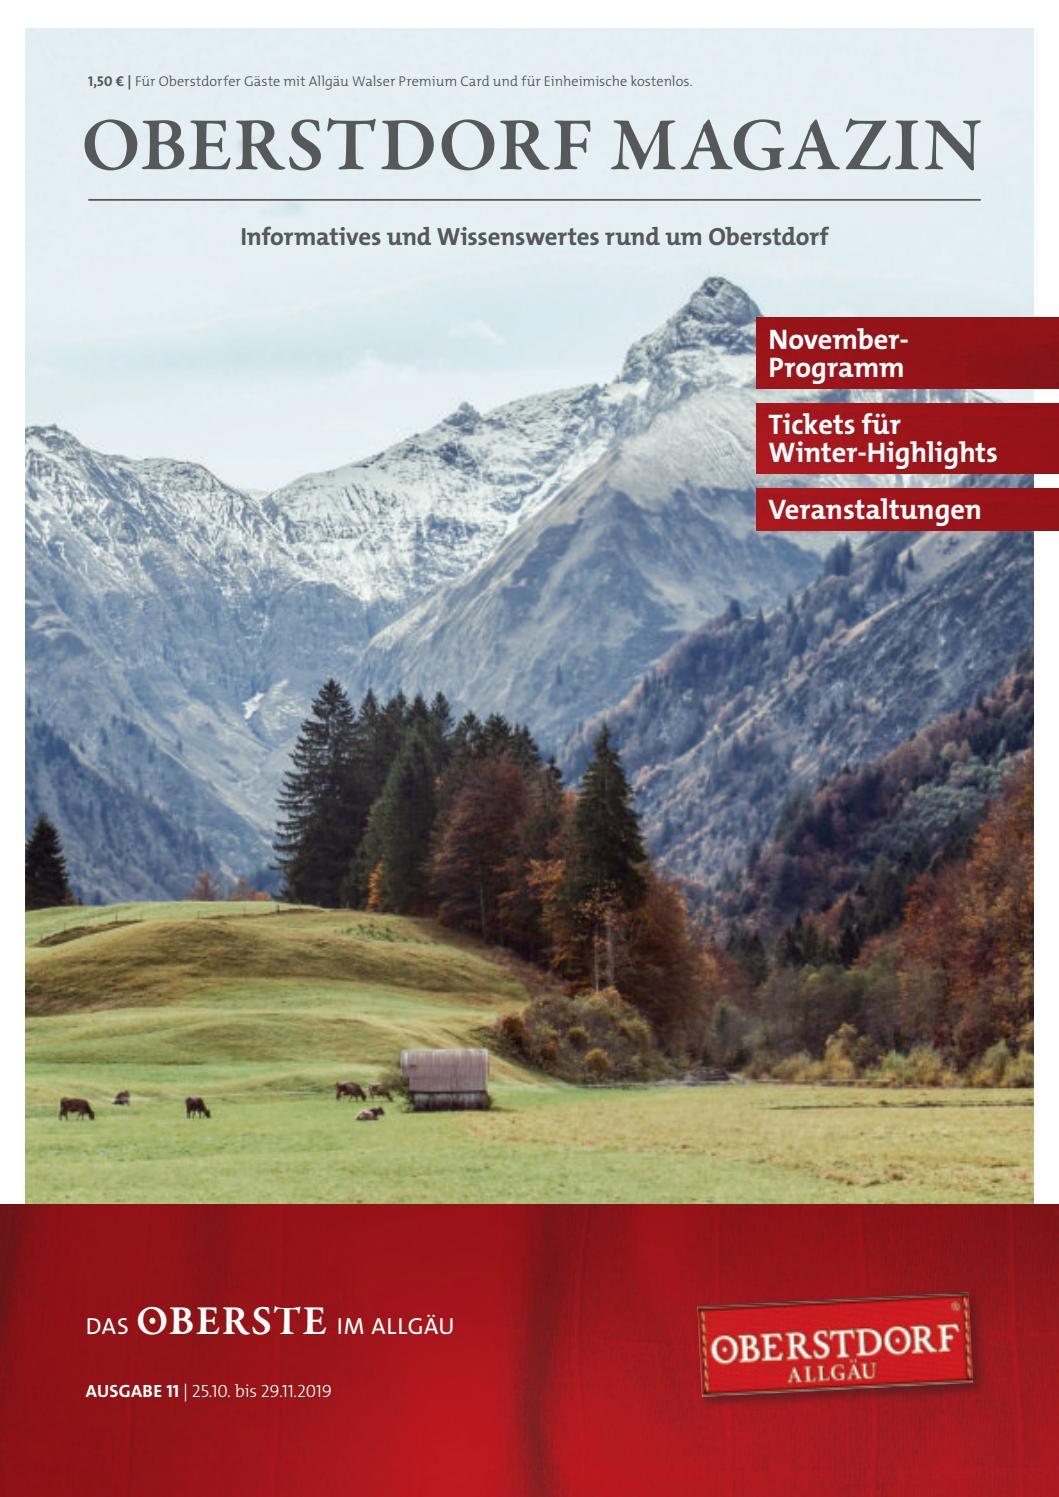 Oberstdorf Magazin 112019 by Tourismus Oberstdorf issuu